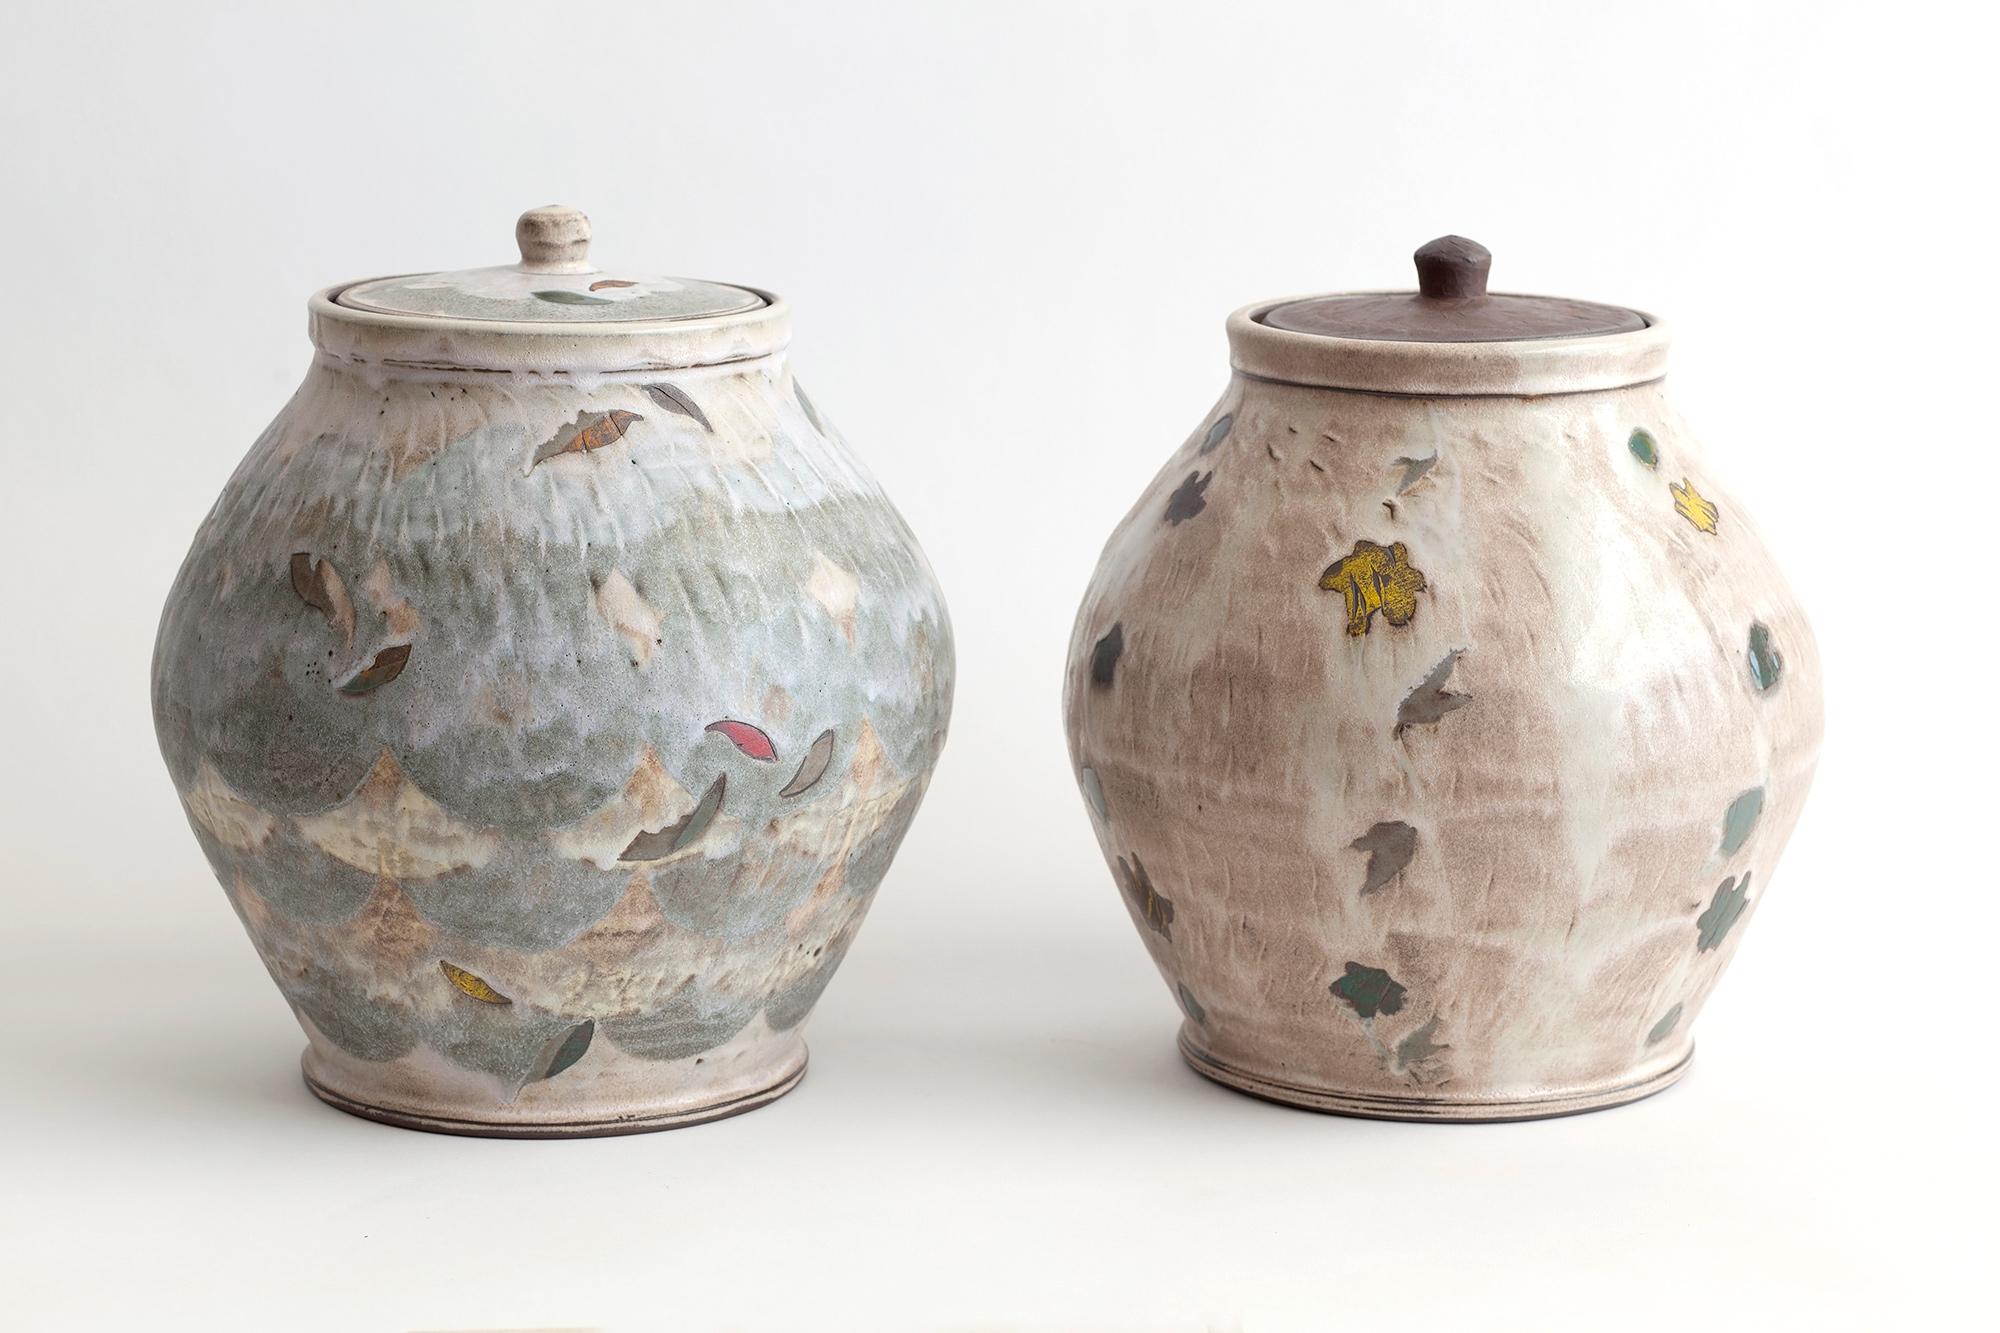 Sanam Emami, Storage Jar 1 and 2, 2021